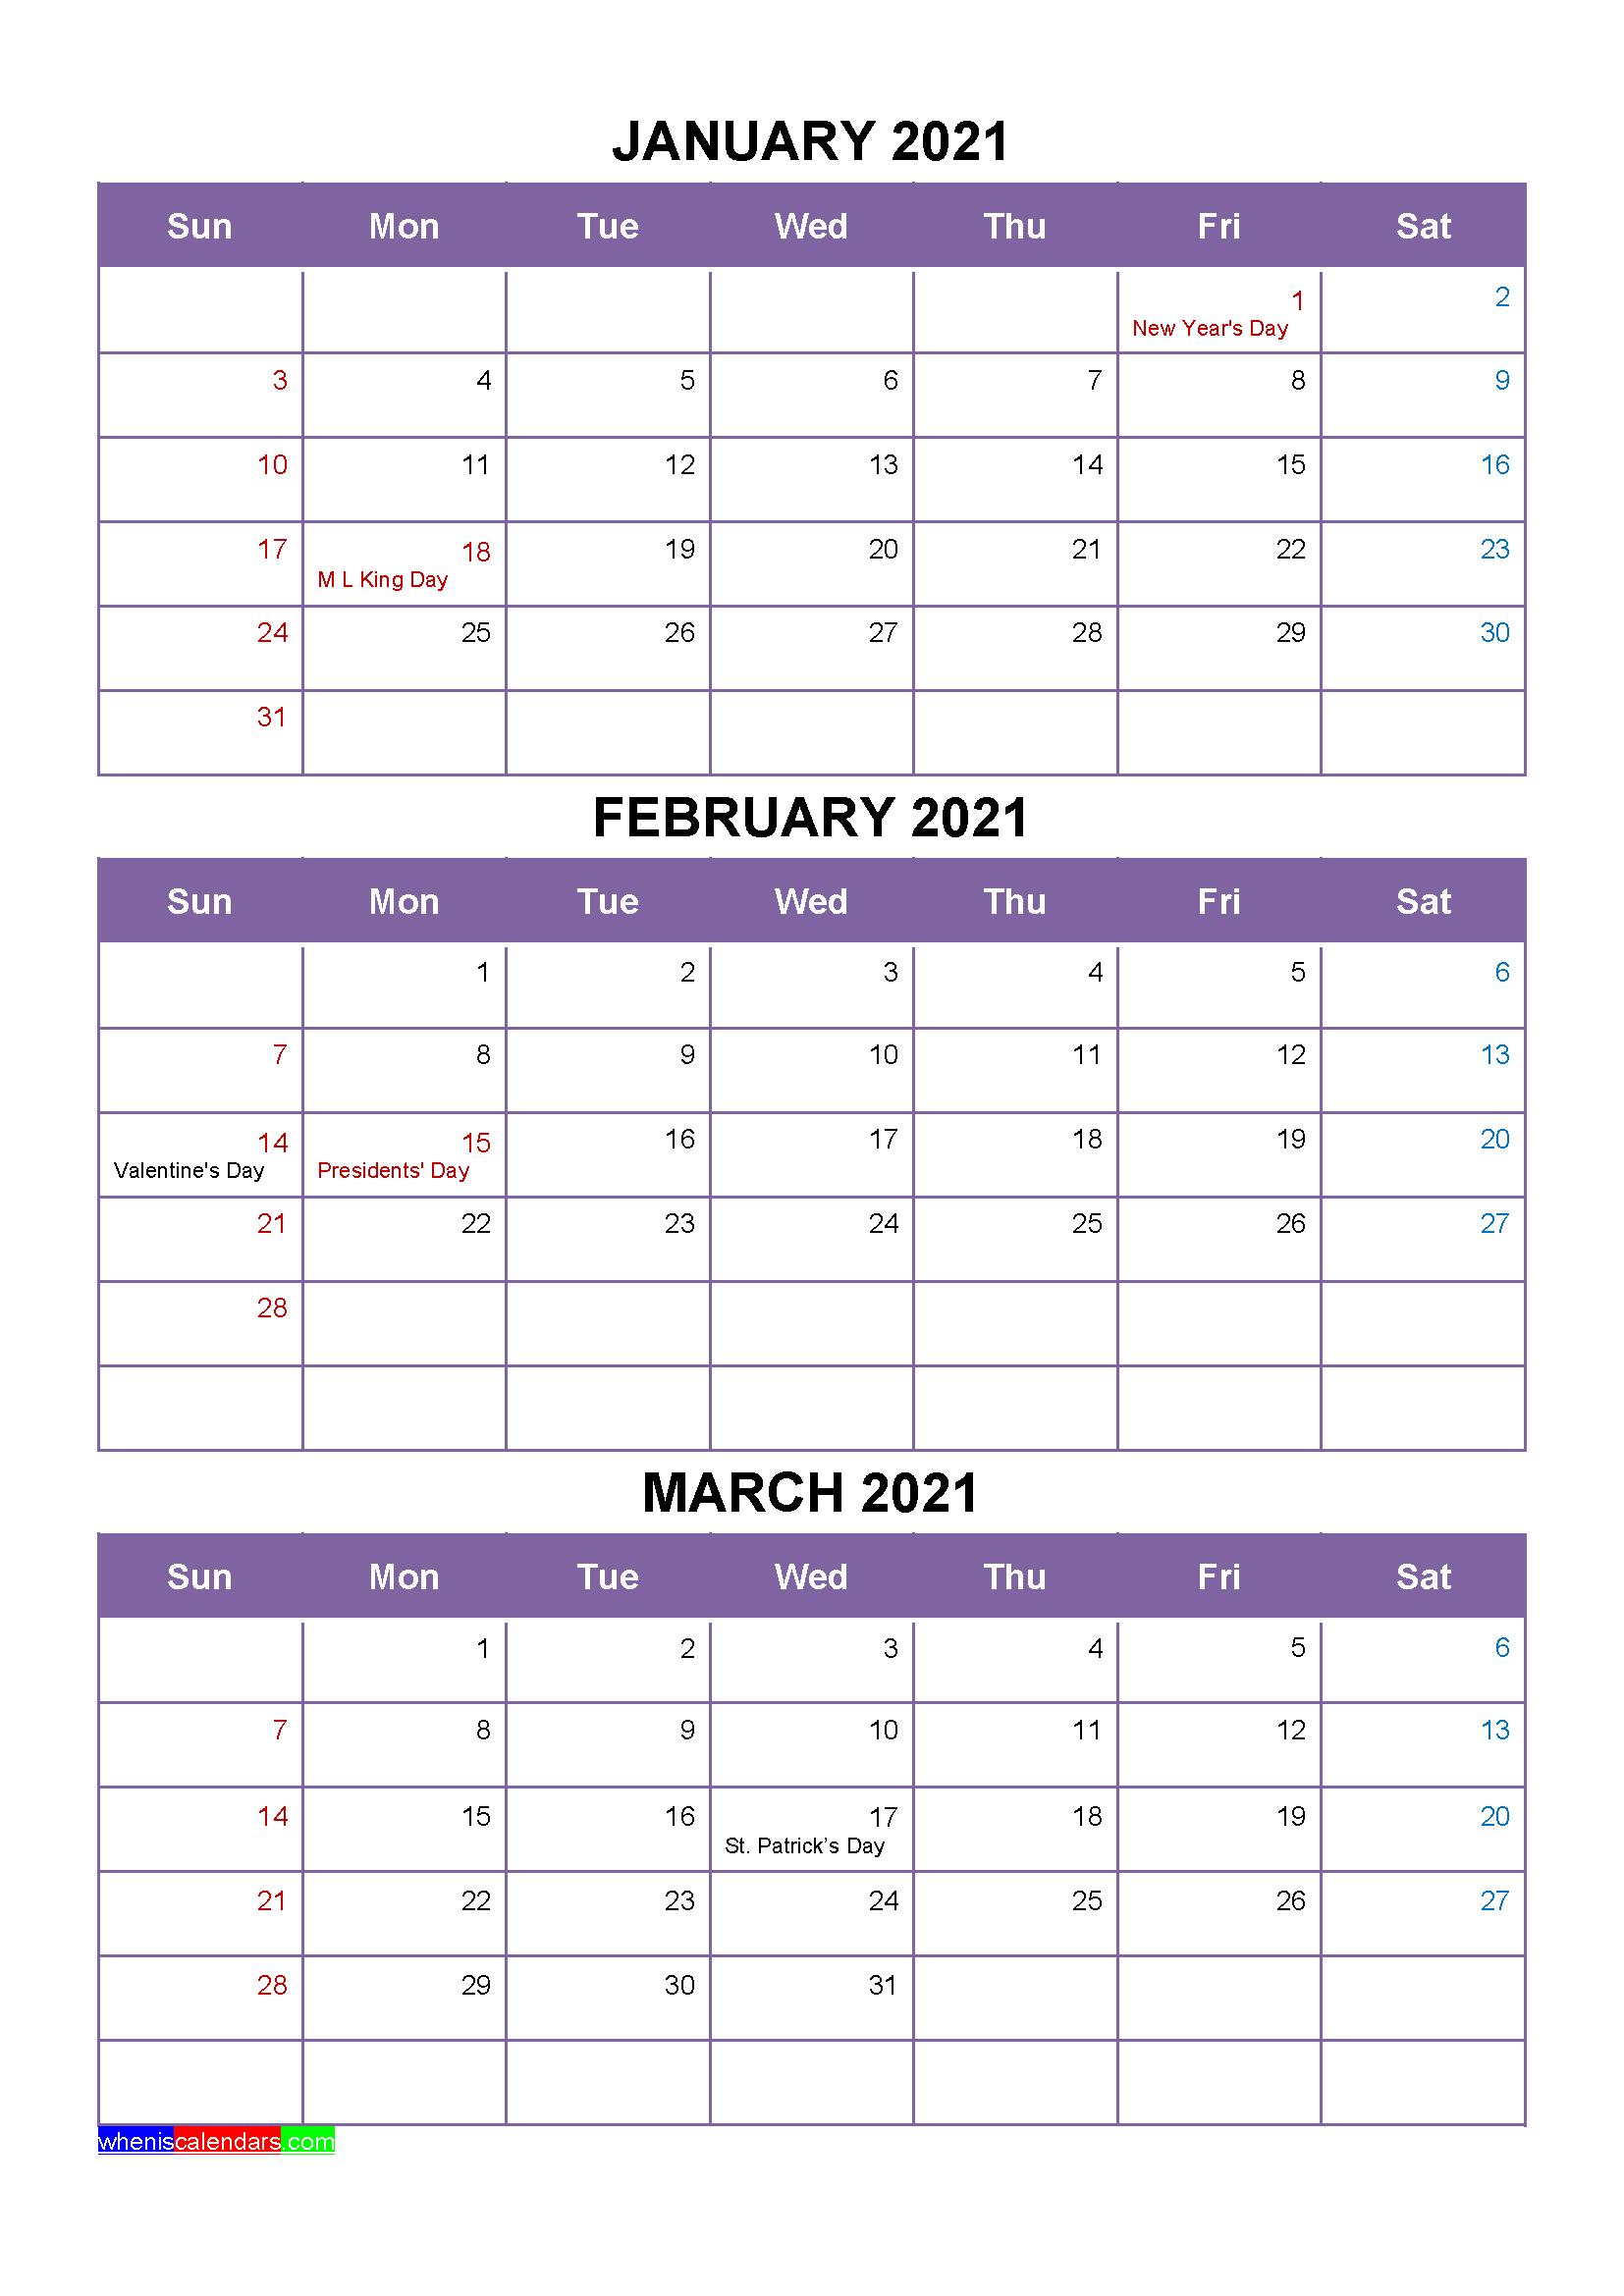 Free January February March 2021 Printable Calendar Template